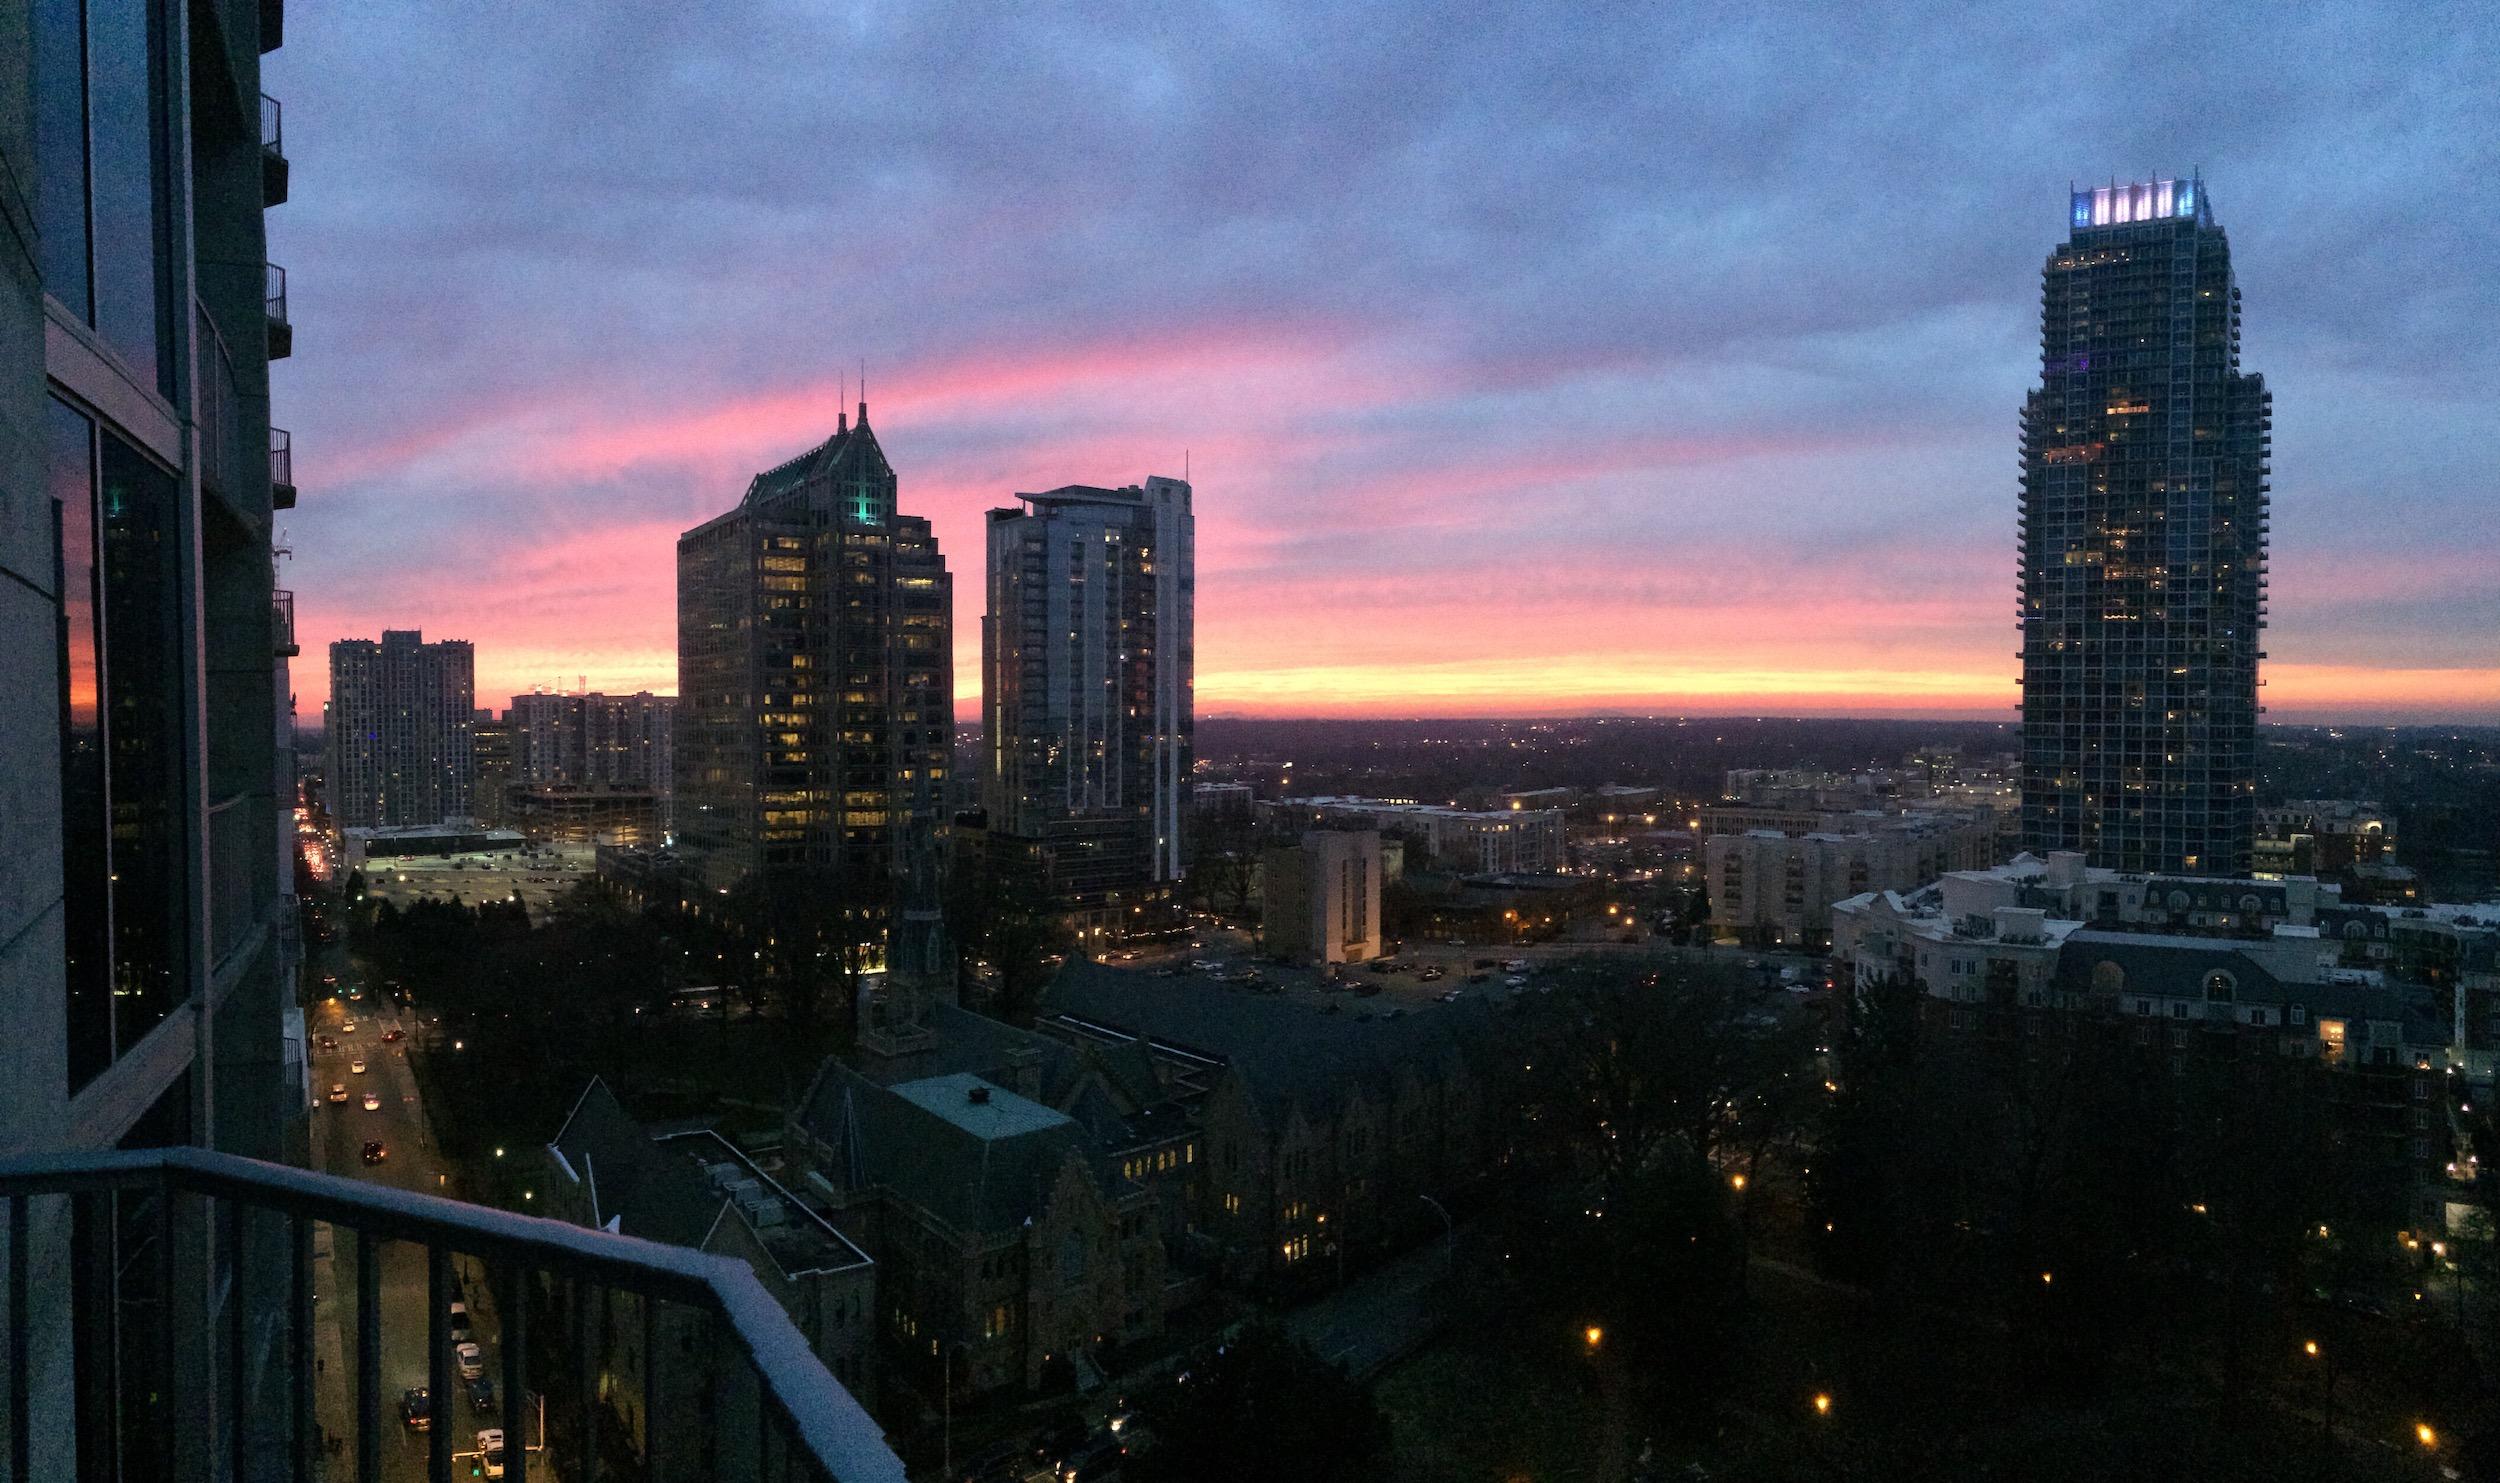 Skyline of Charlotte, NC